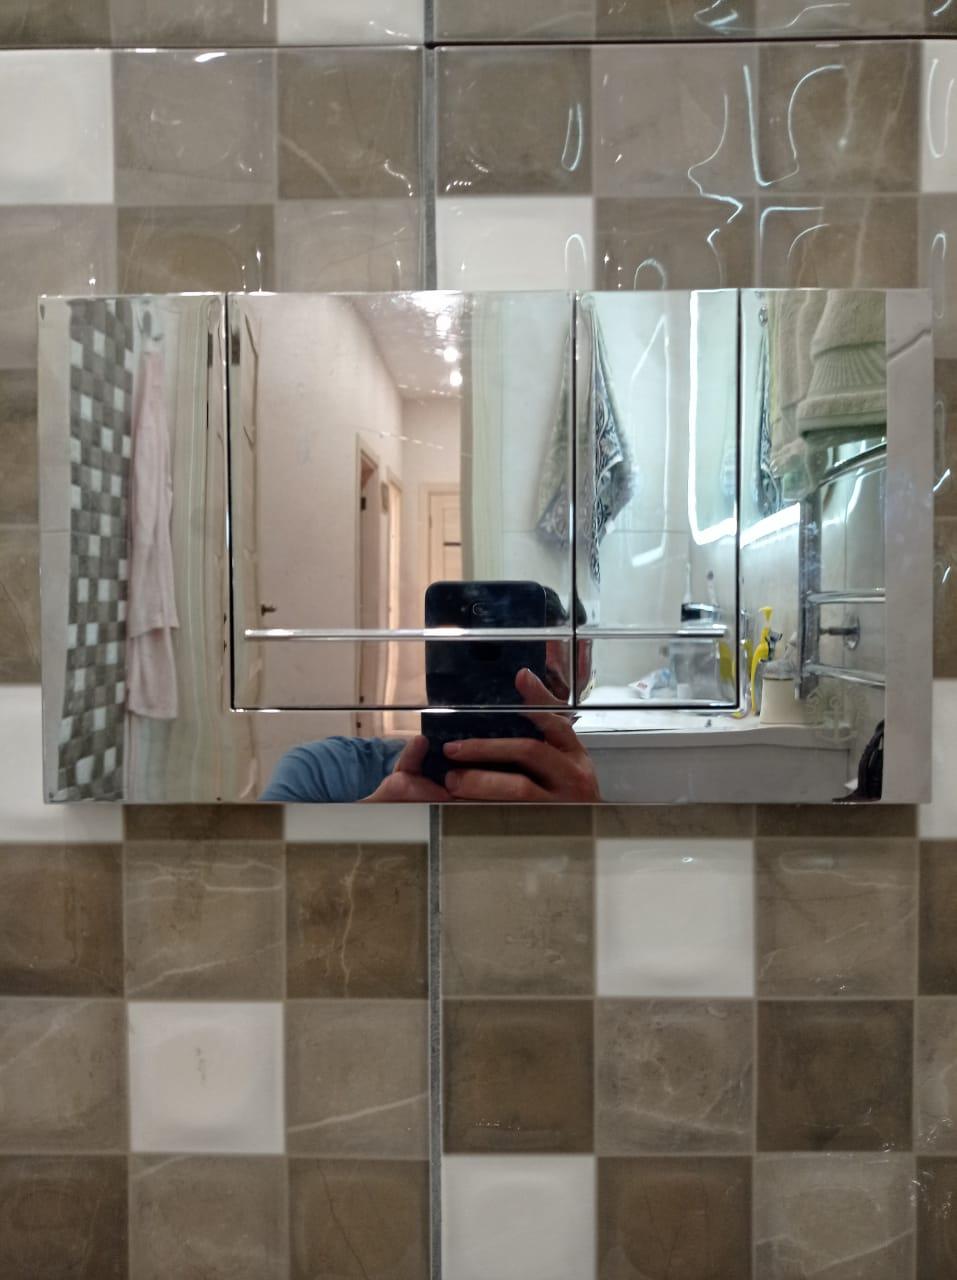 remont_installacii_gustavsberg_4_01.10.2020.jpeg